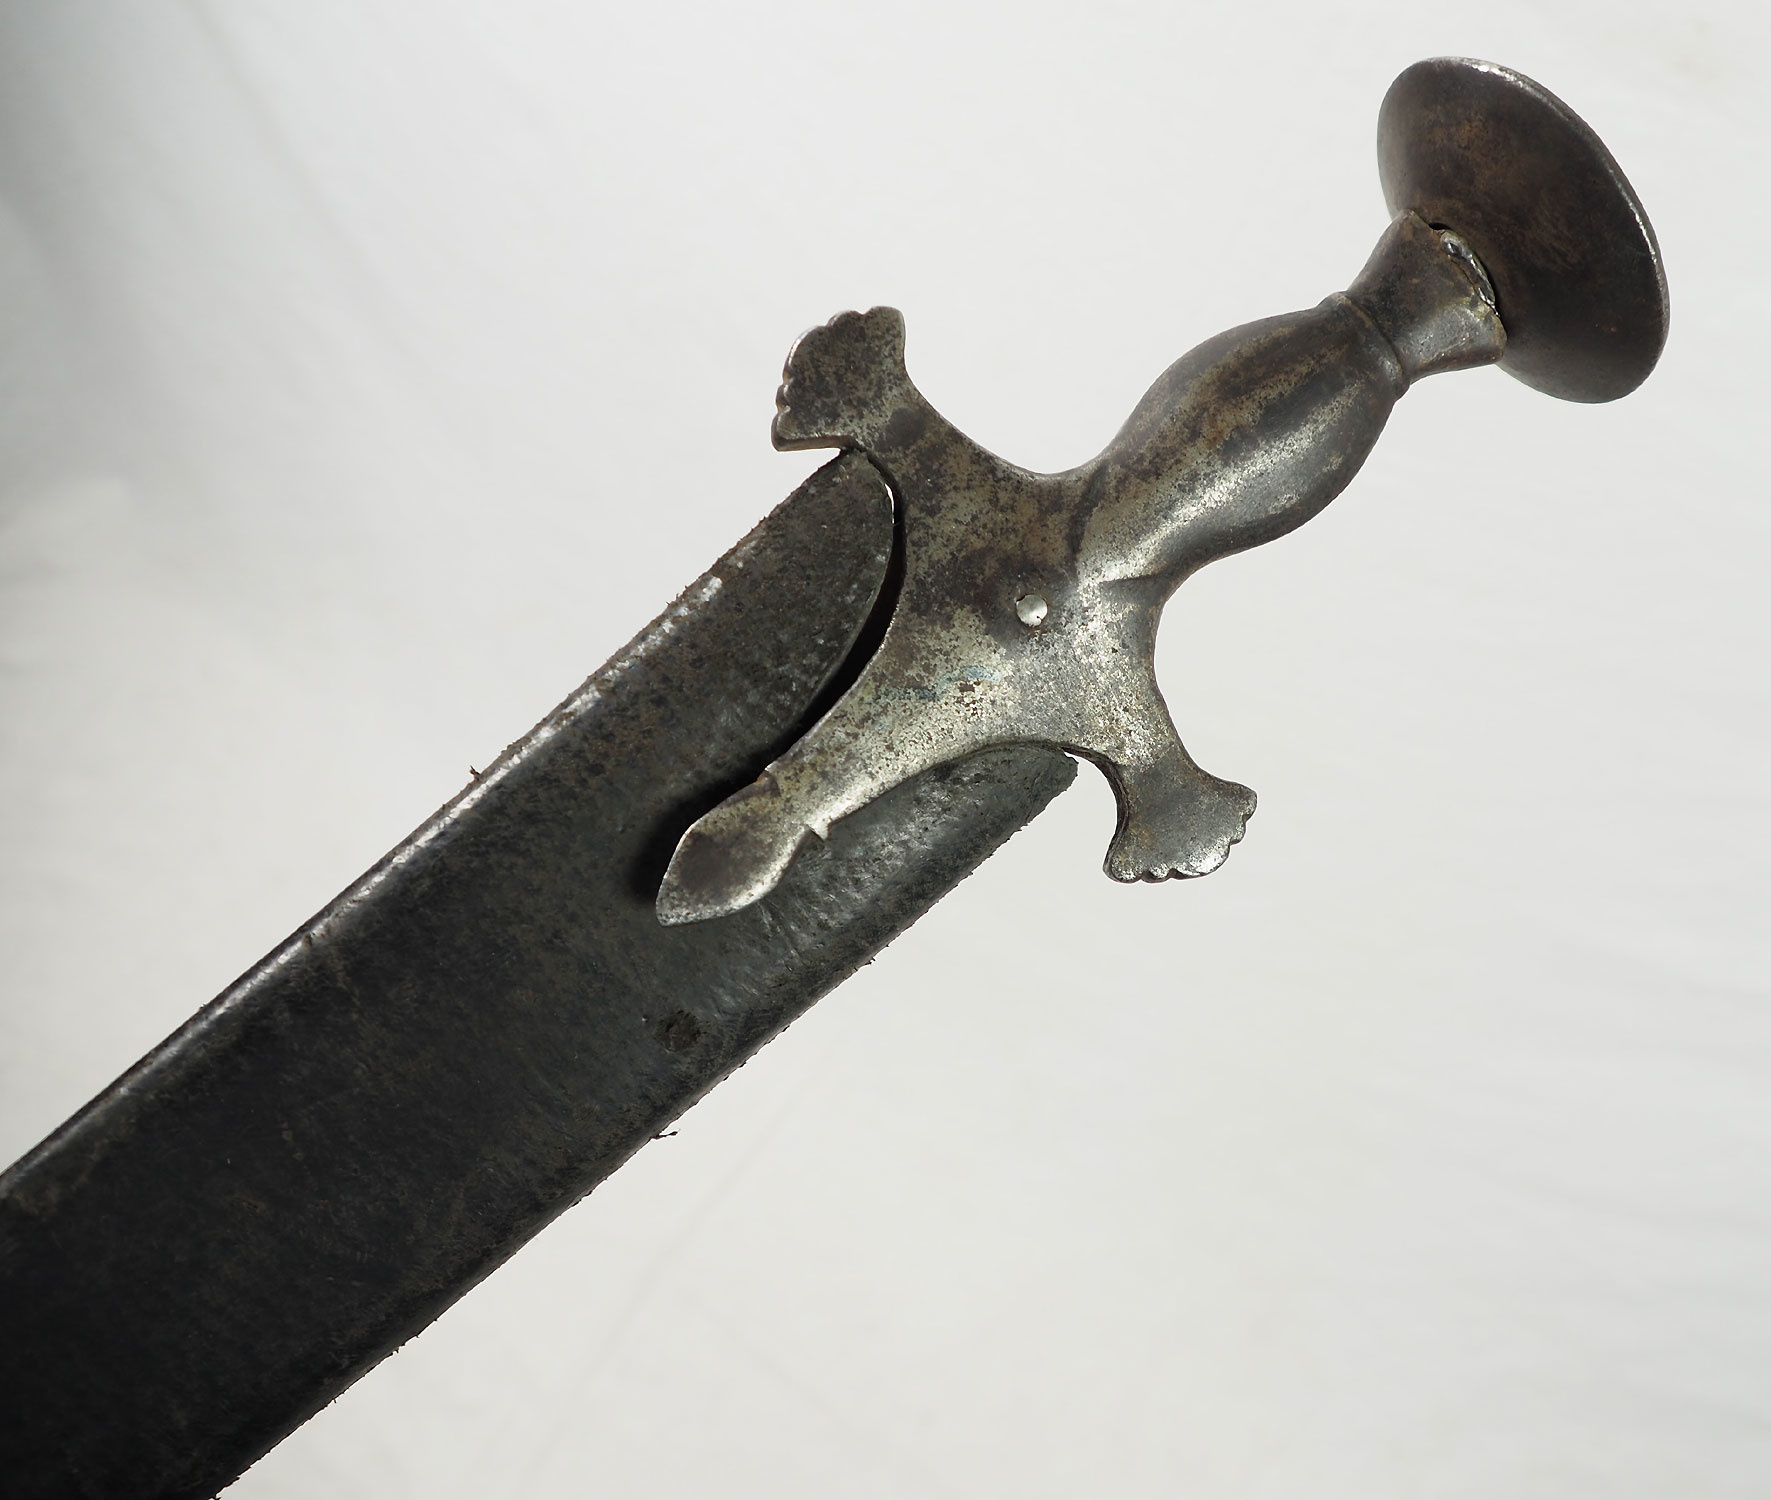 Antike Säbel messer schwert shamshir sword Knife aus Afghanistan Nr:19/ G